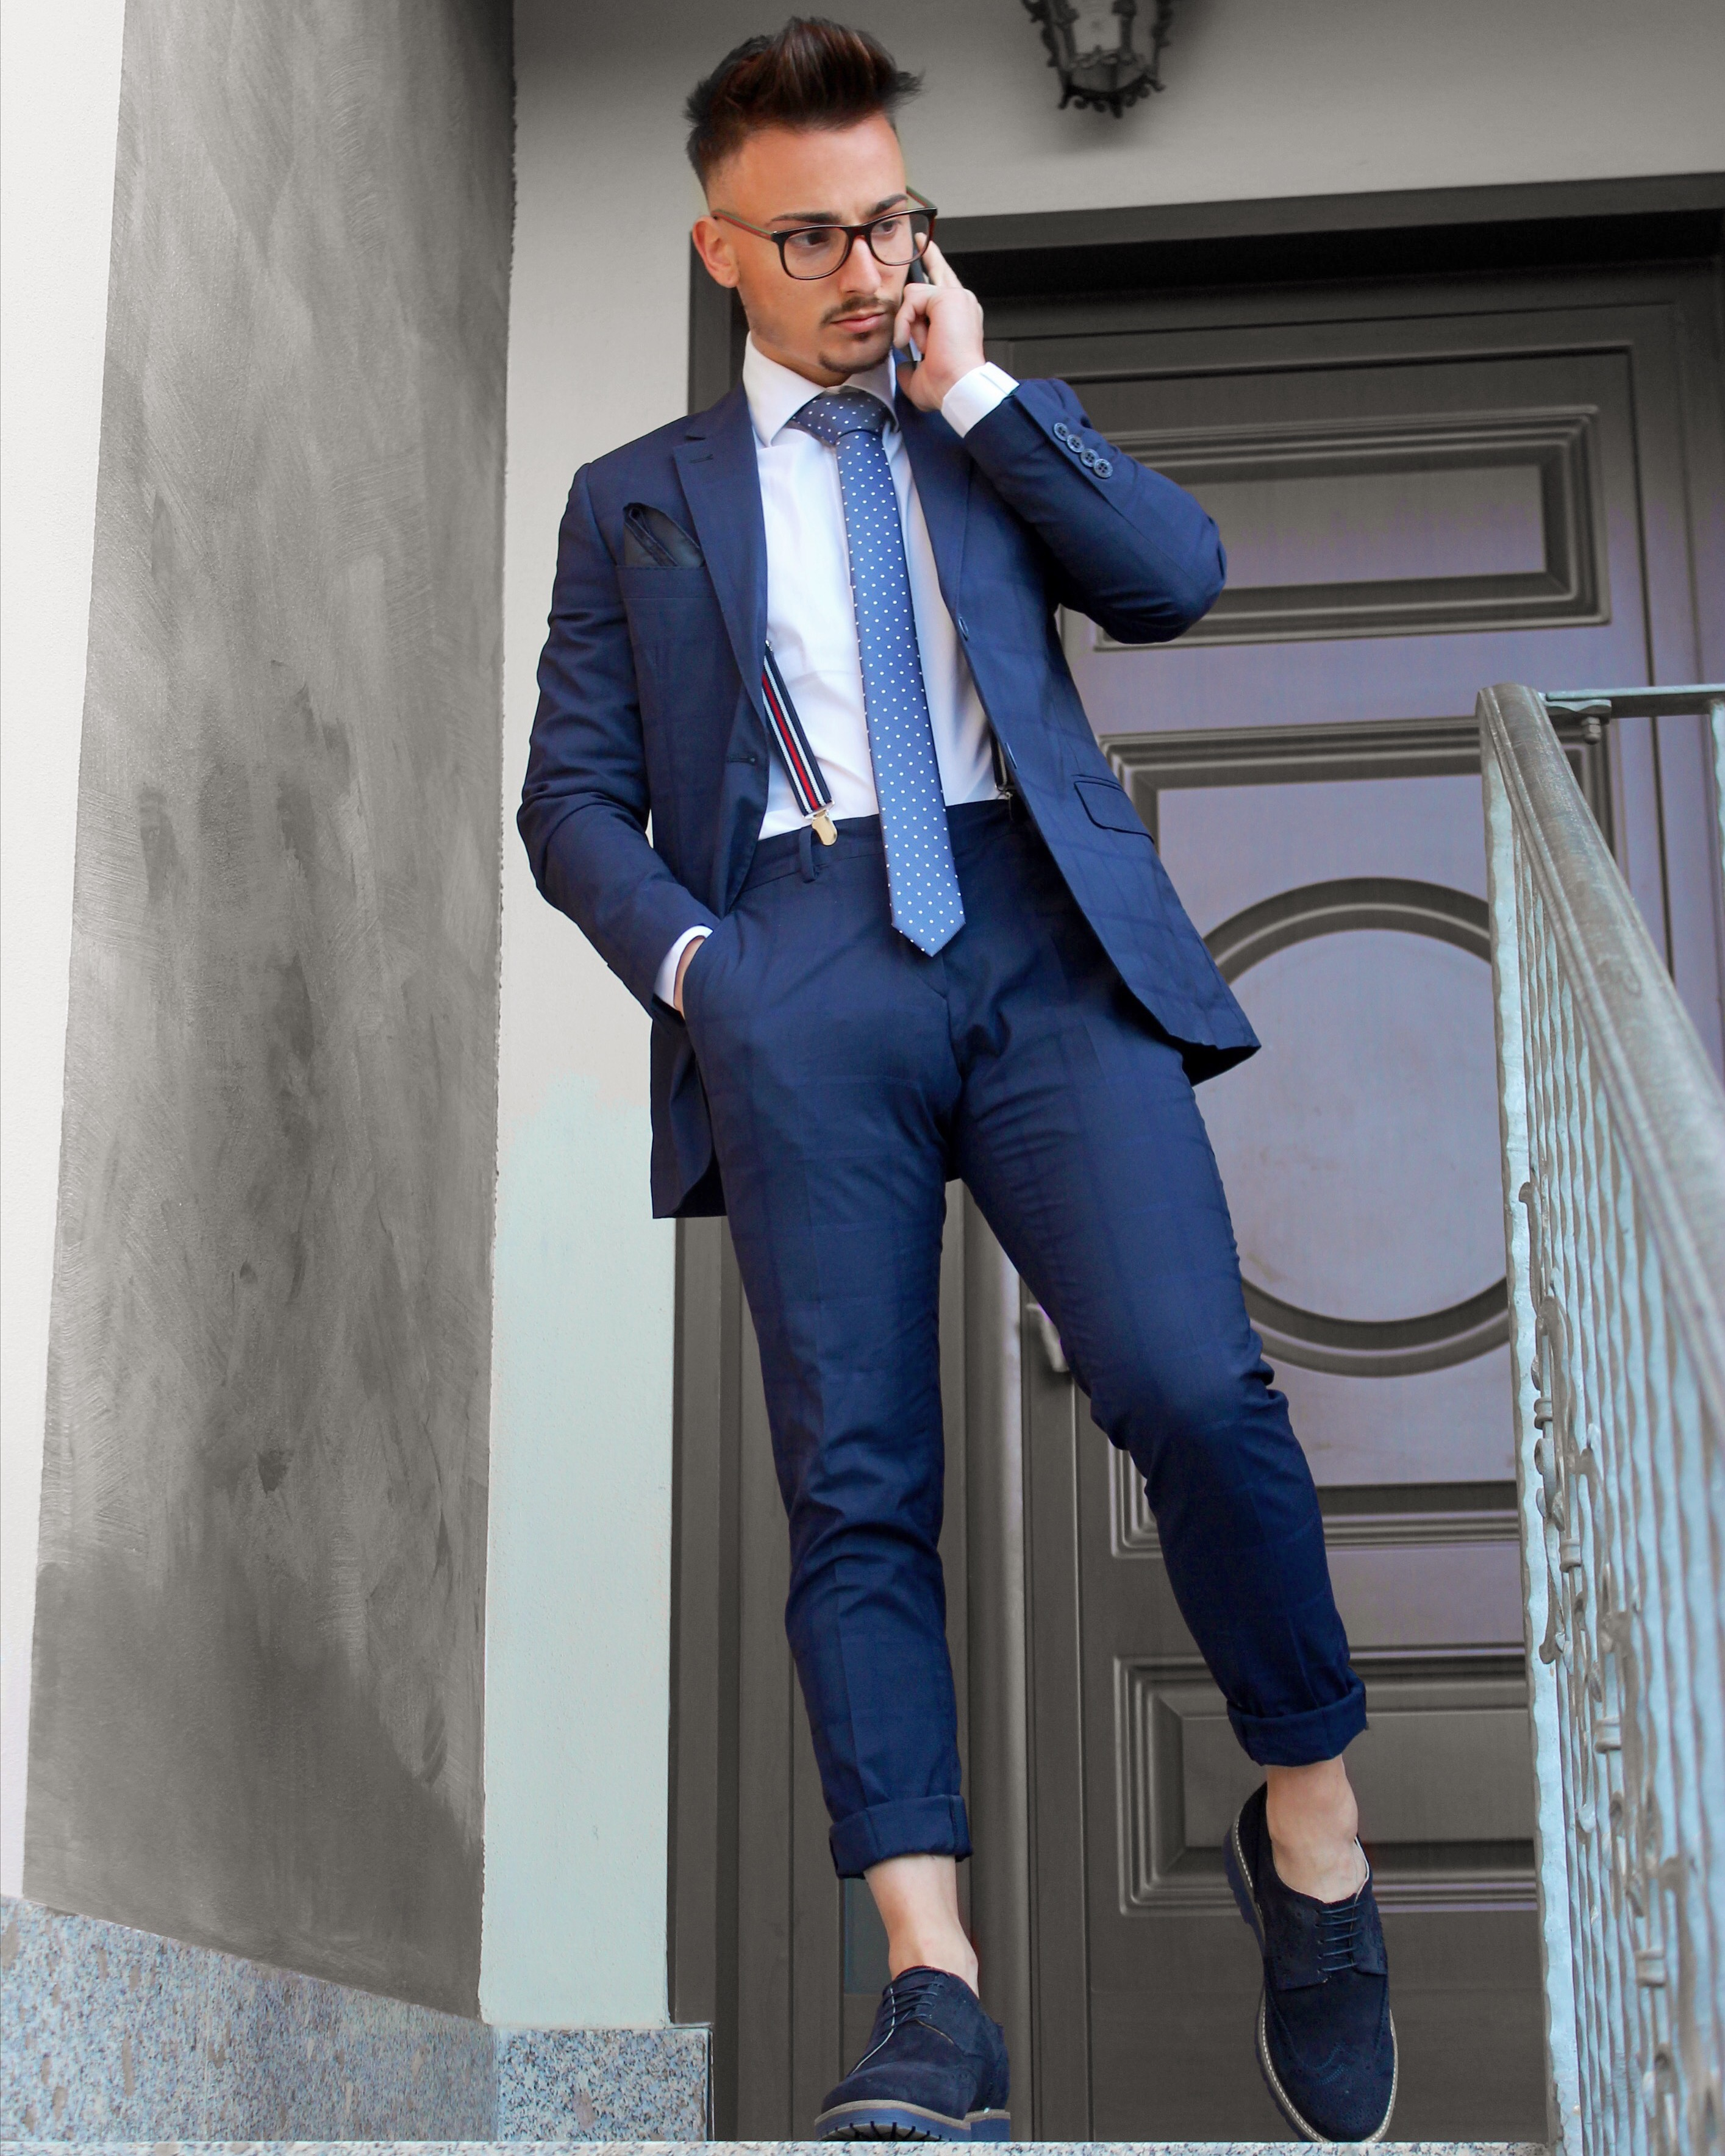 6529354834 Da Giovanili Blu Eleganti Uomo – Vestiti Cerimonia 9eEWID2HY